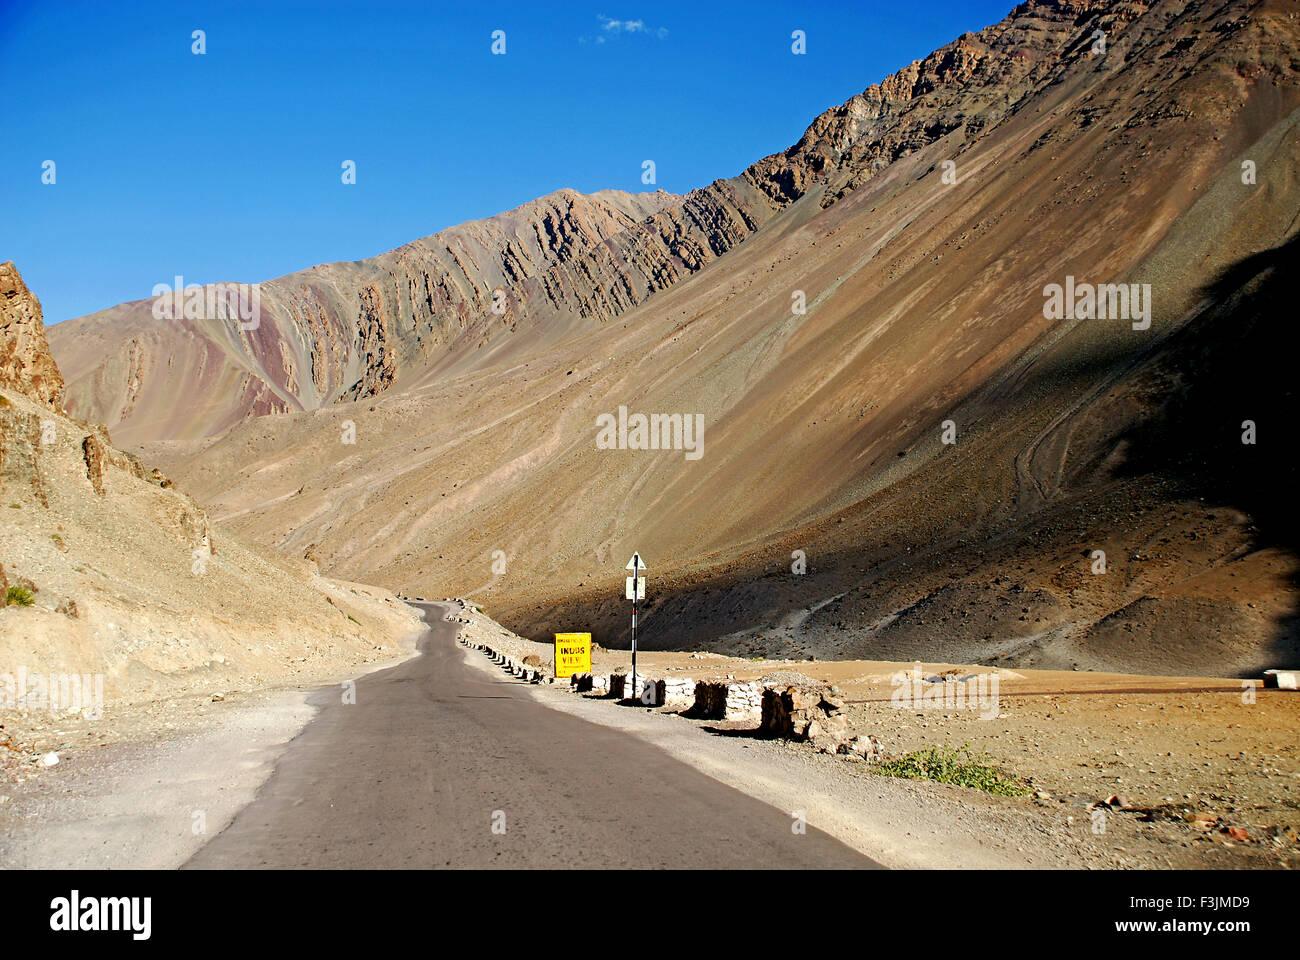 A way among the brown desert mountains ; Ladakh ; Jammu & Kashmir ; India - Stock Image